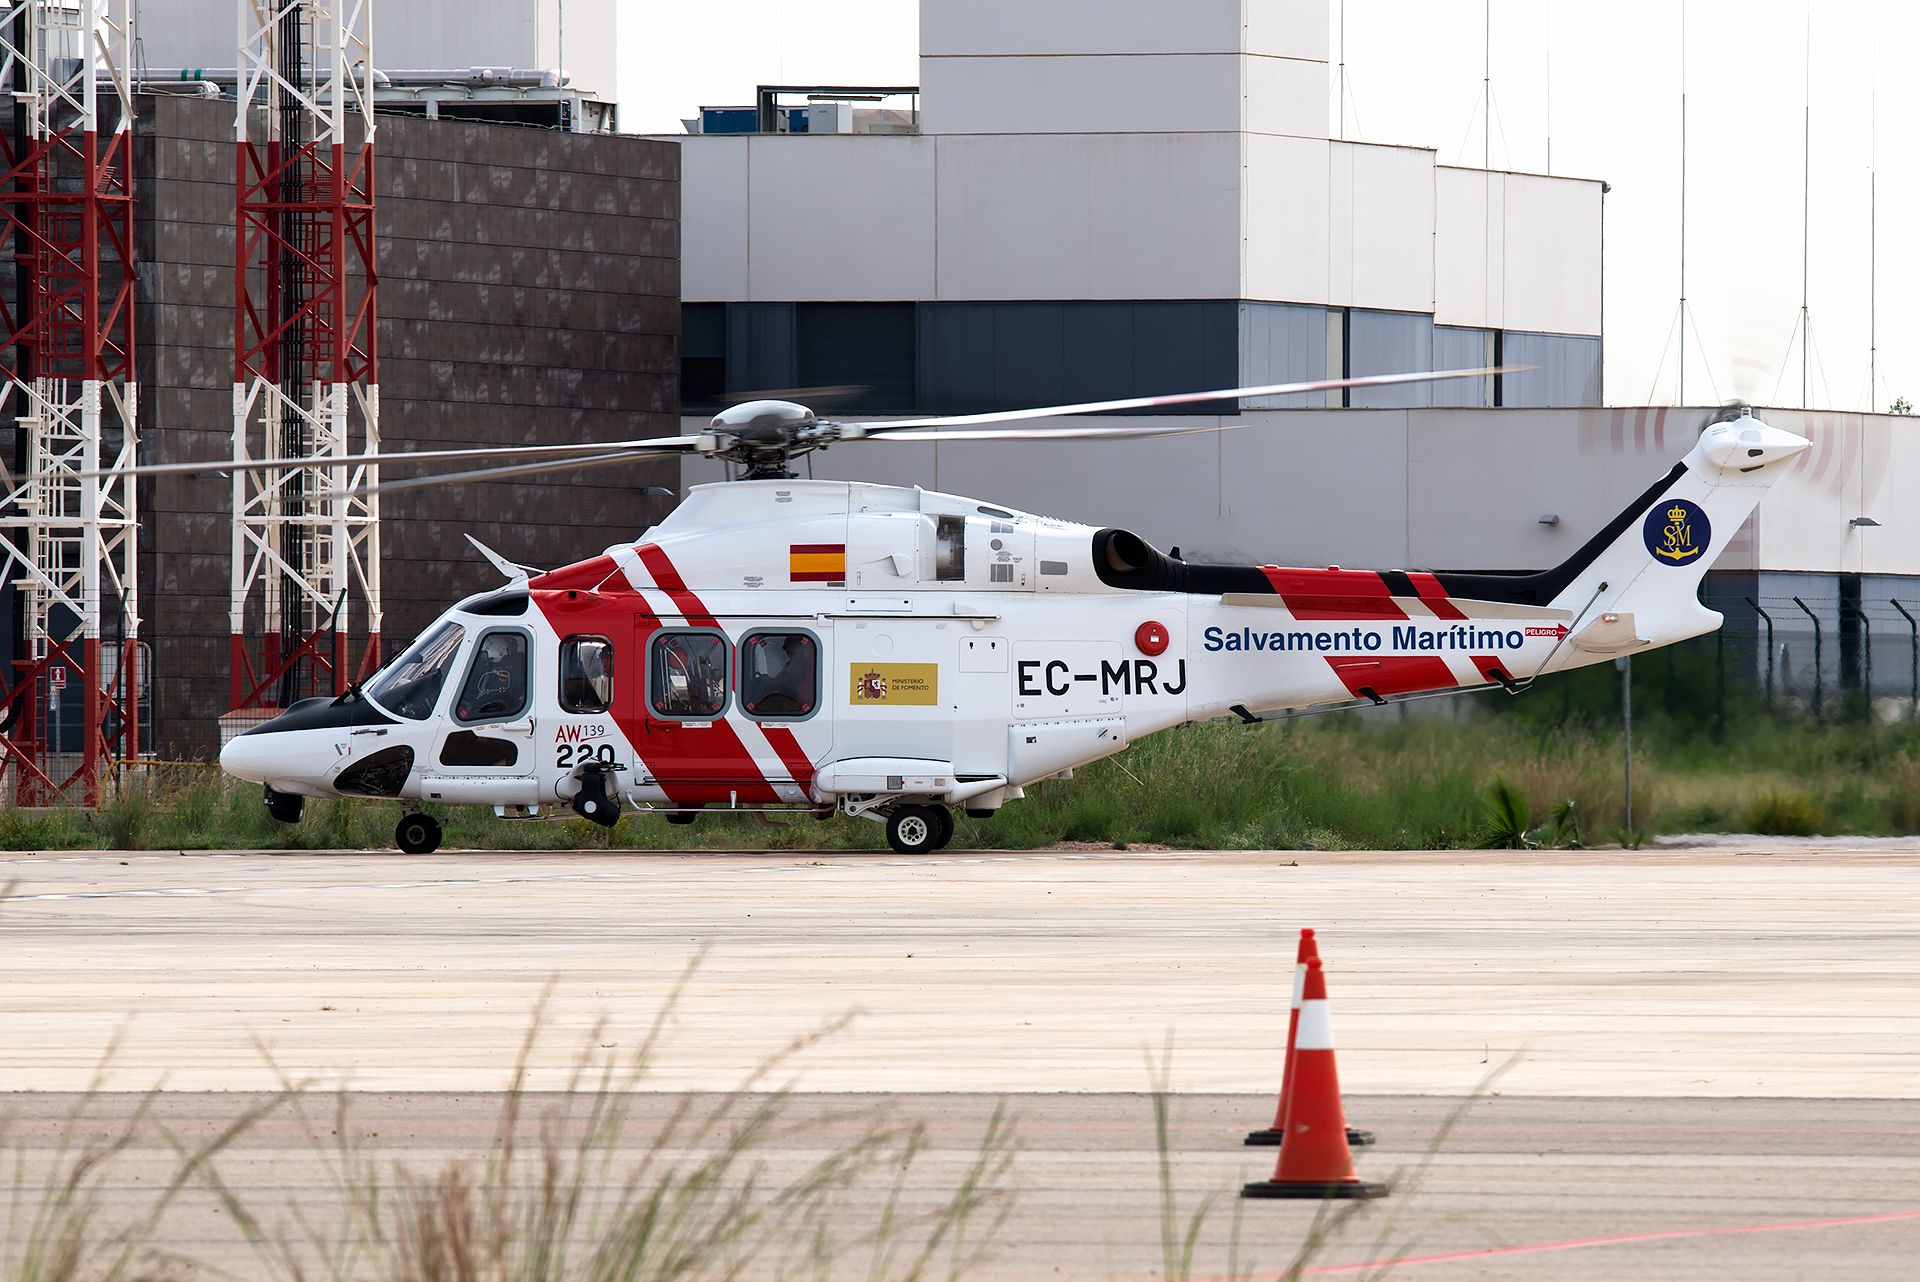 Click image for larger version.  Name:EC-MRJ_AW139_Spain-Coast-Guard.jpg Views:16 Size:1.60 MB ID:19596